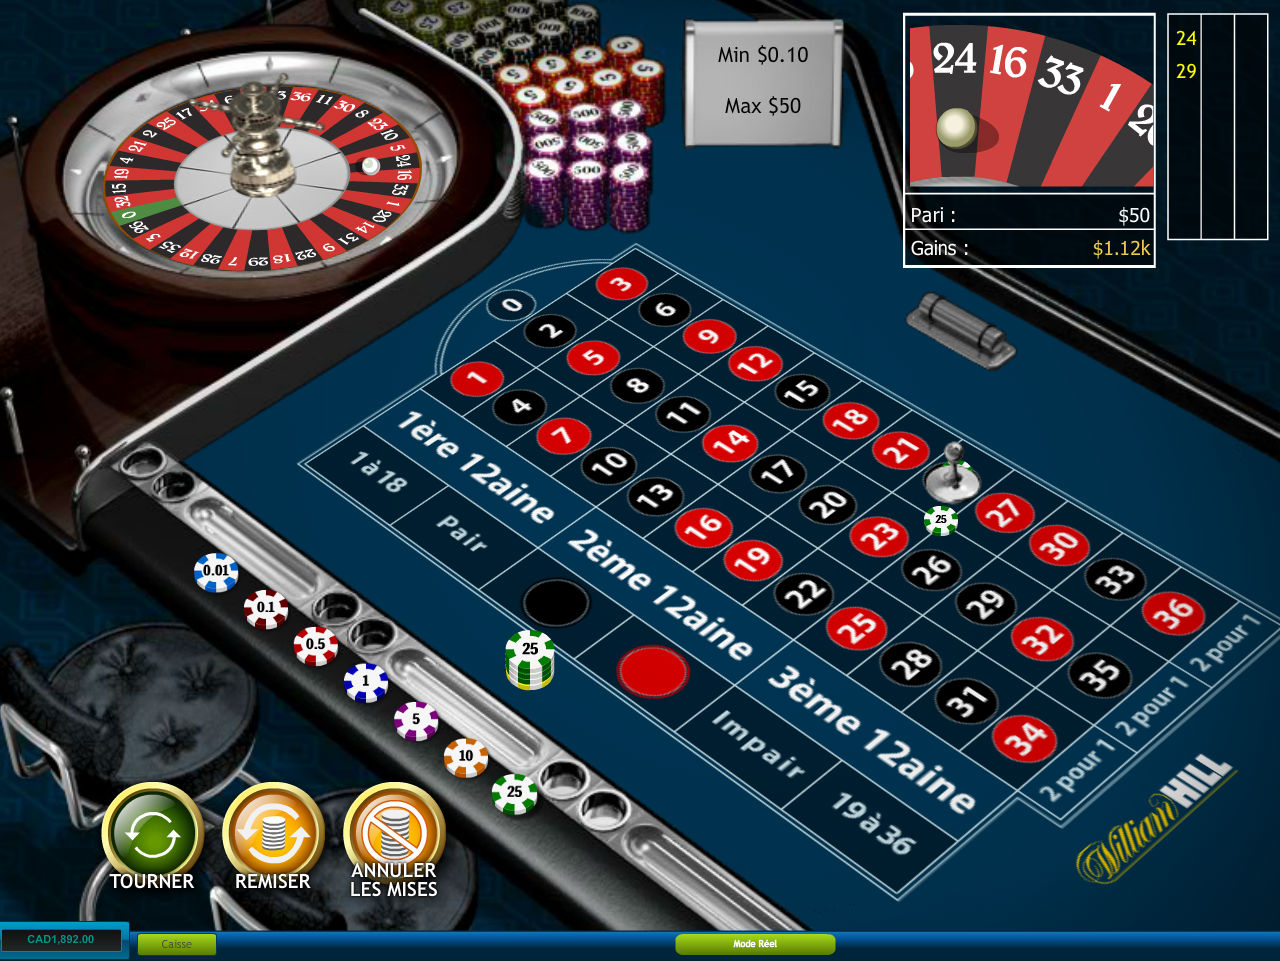 Casino gratuit internet